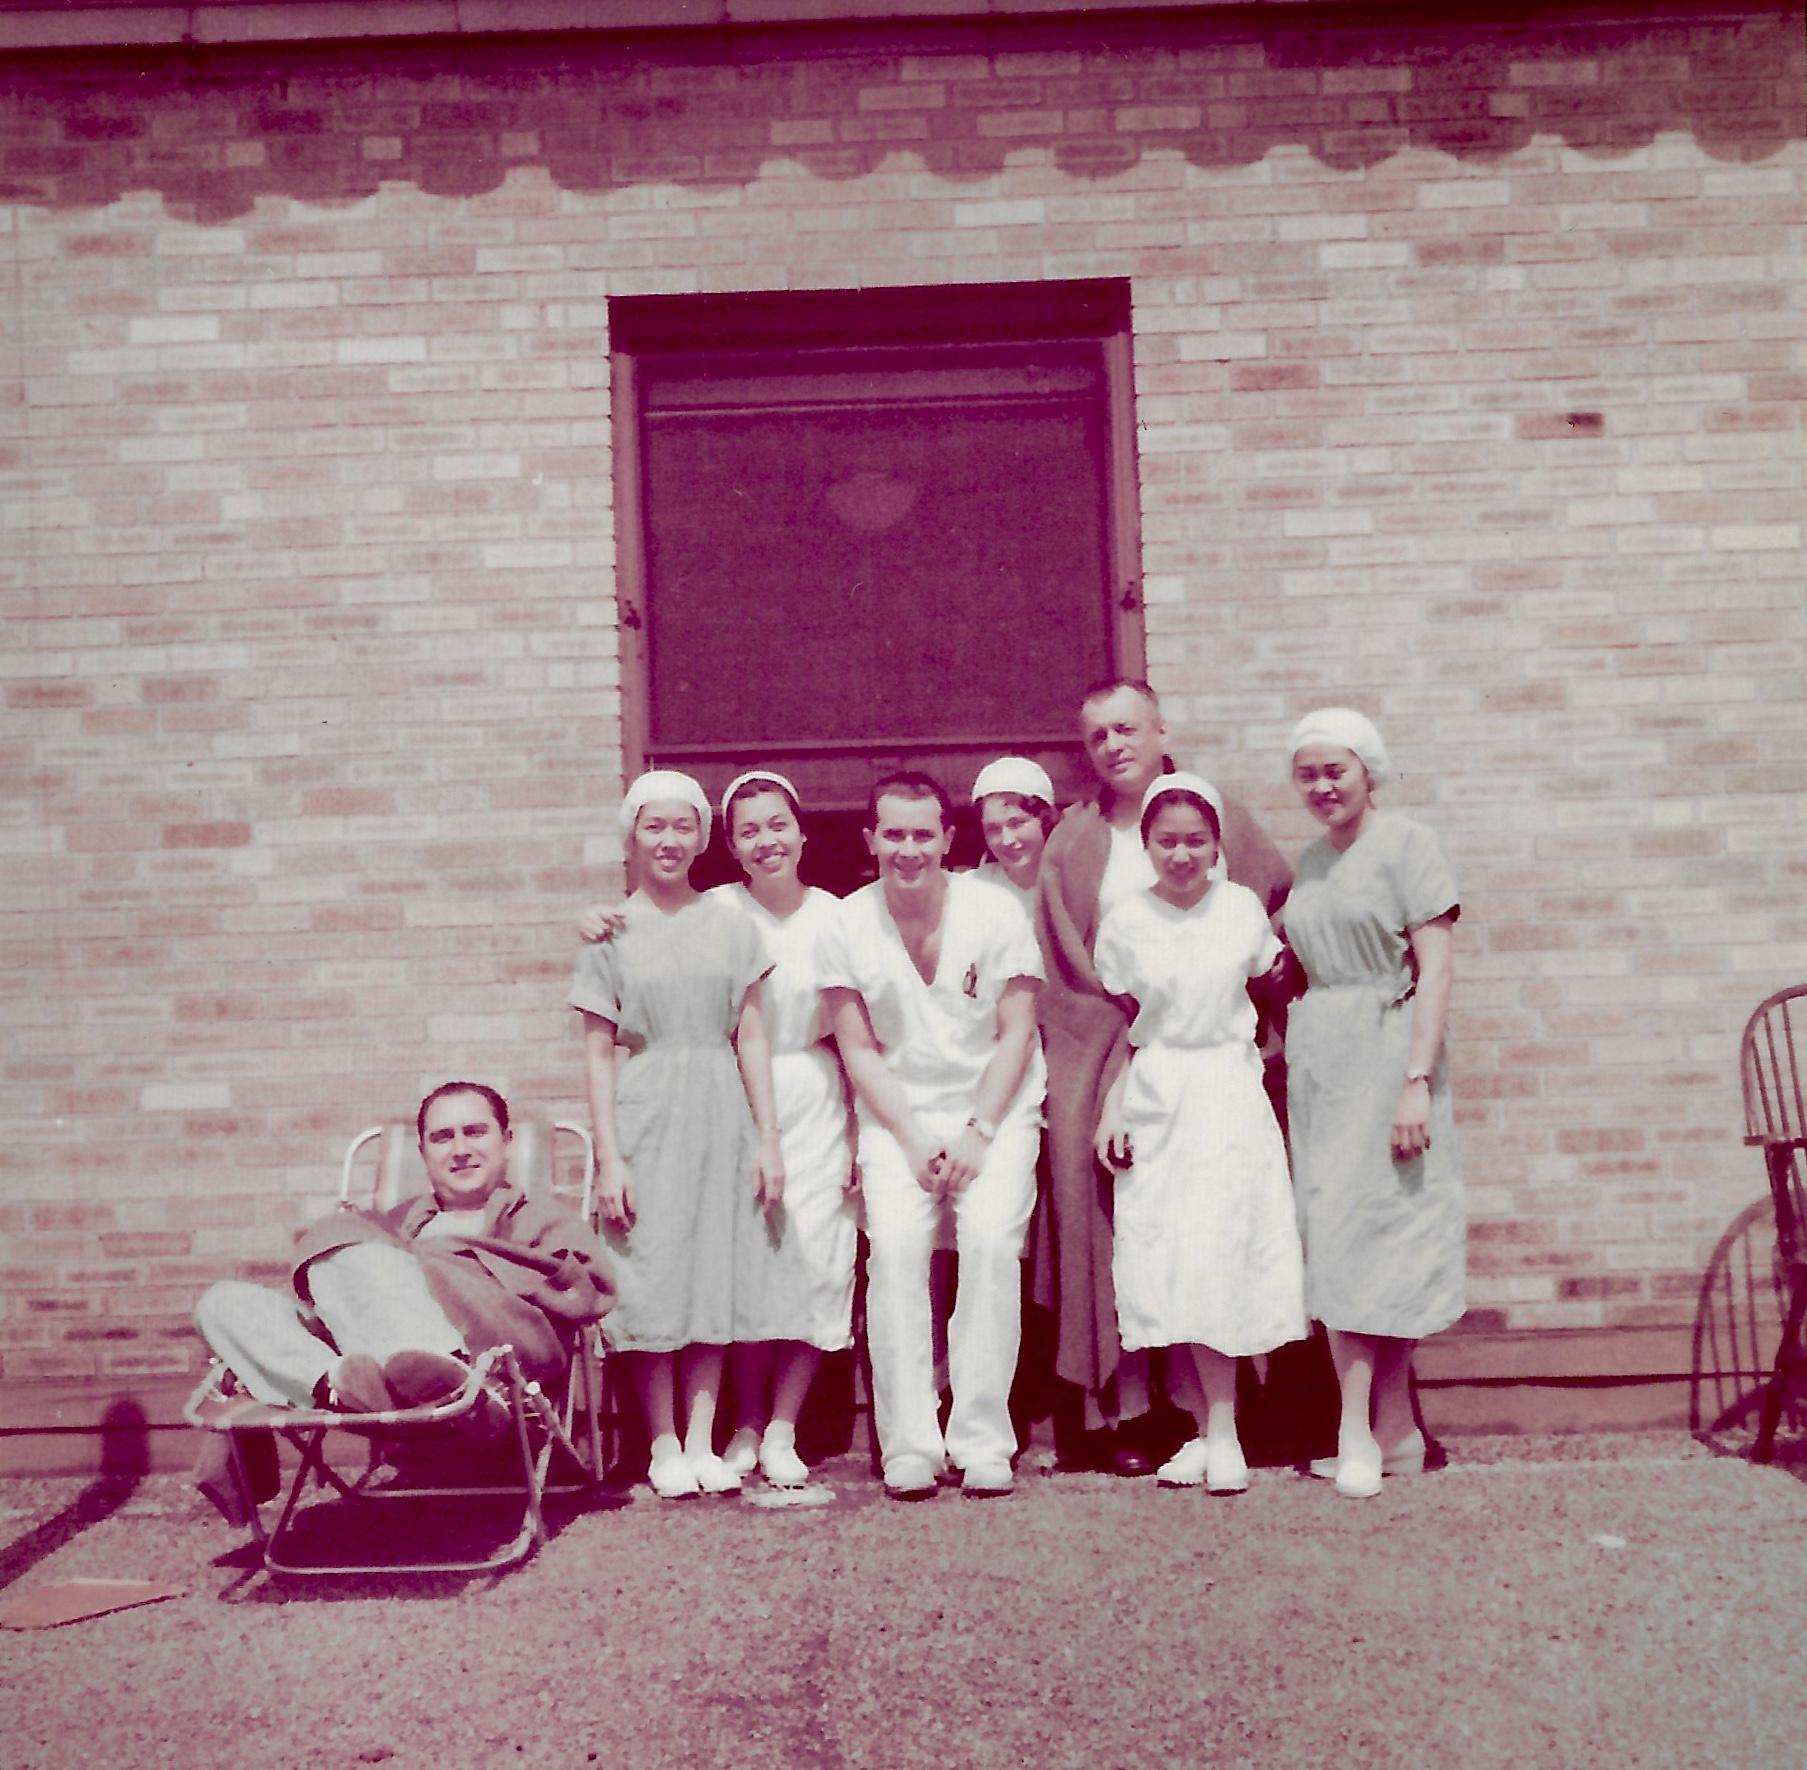 Newark Beth Israel hospital  surgeons and OR staff